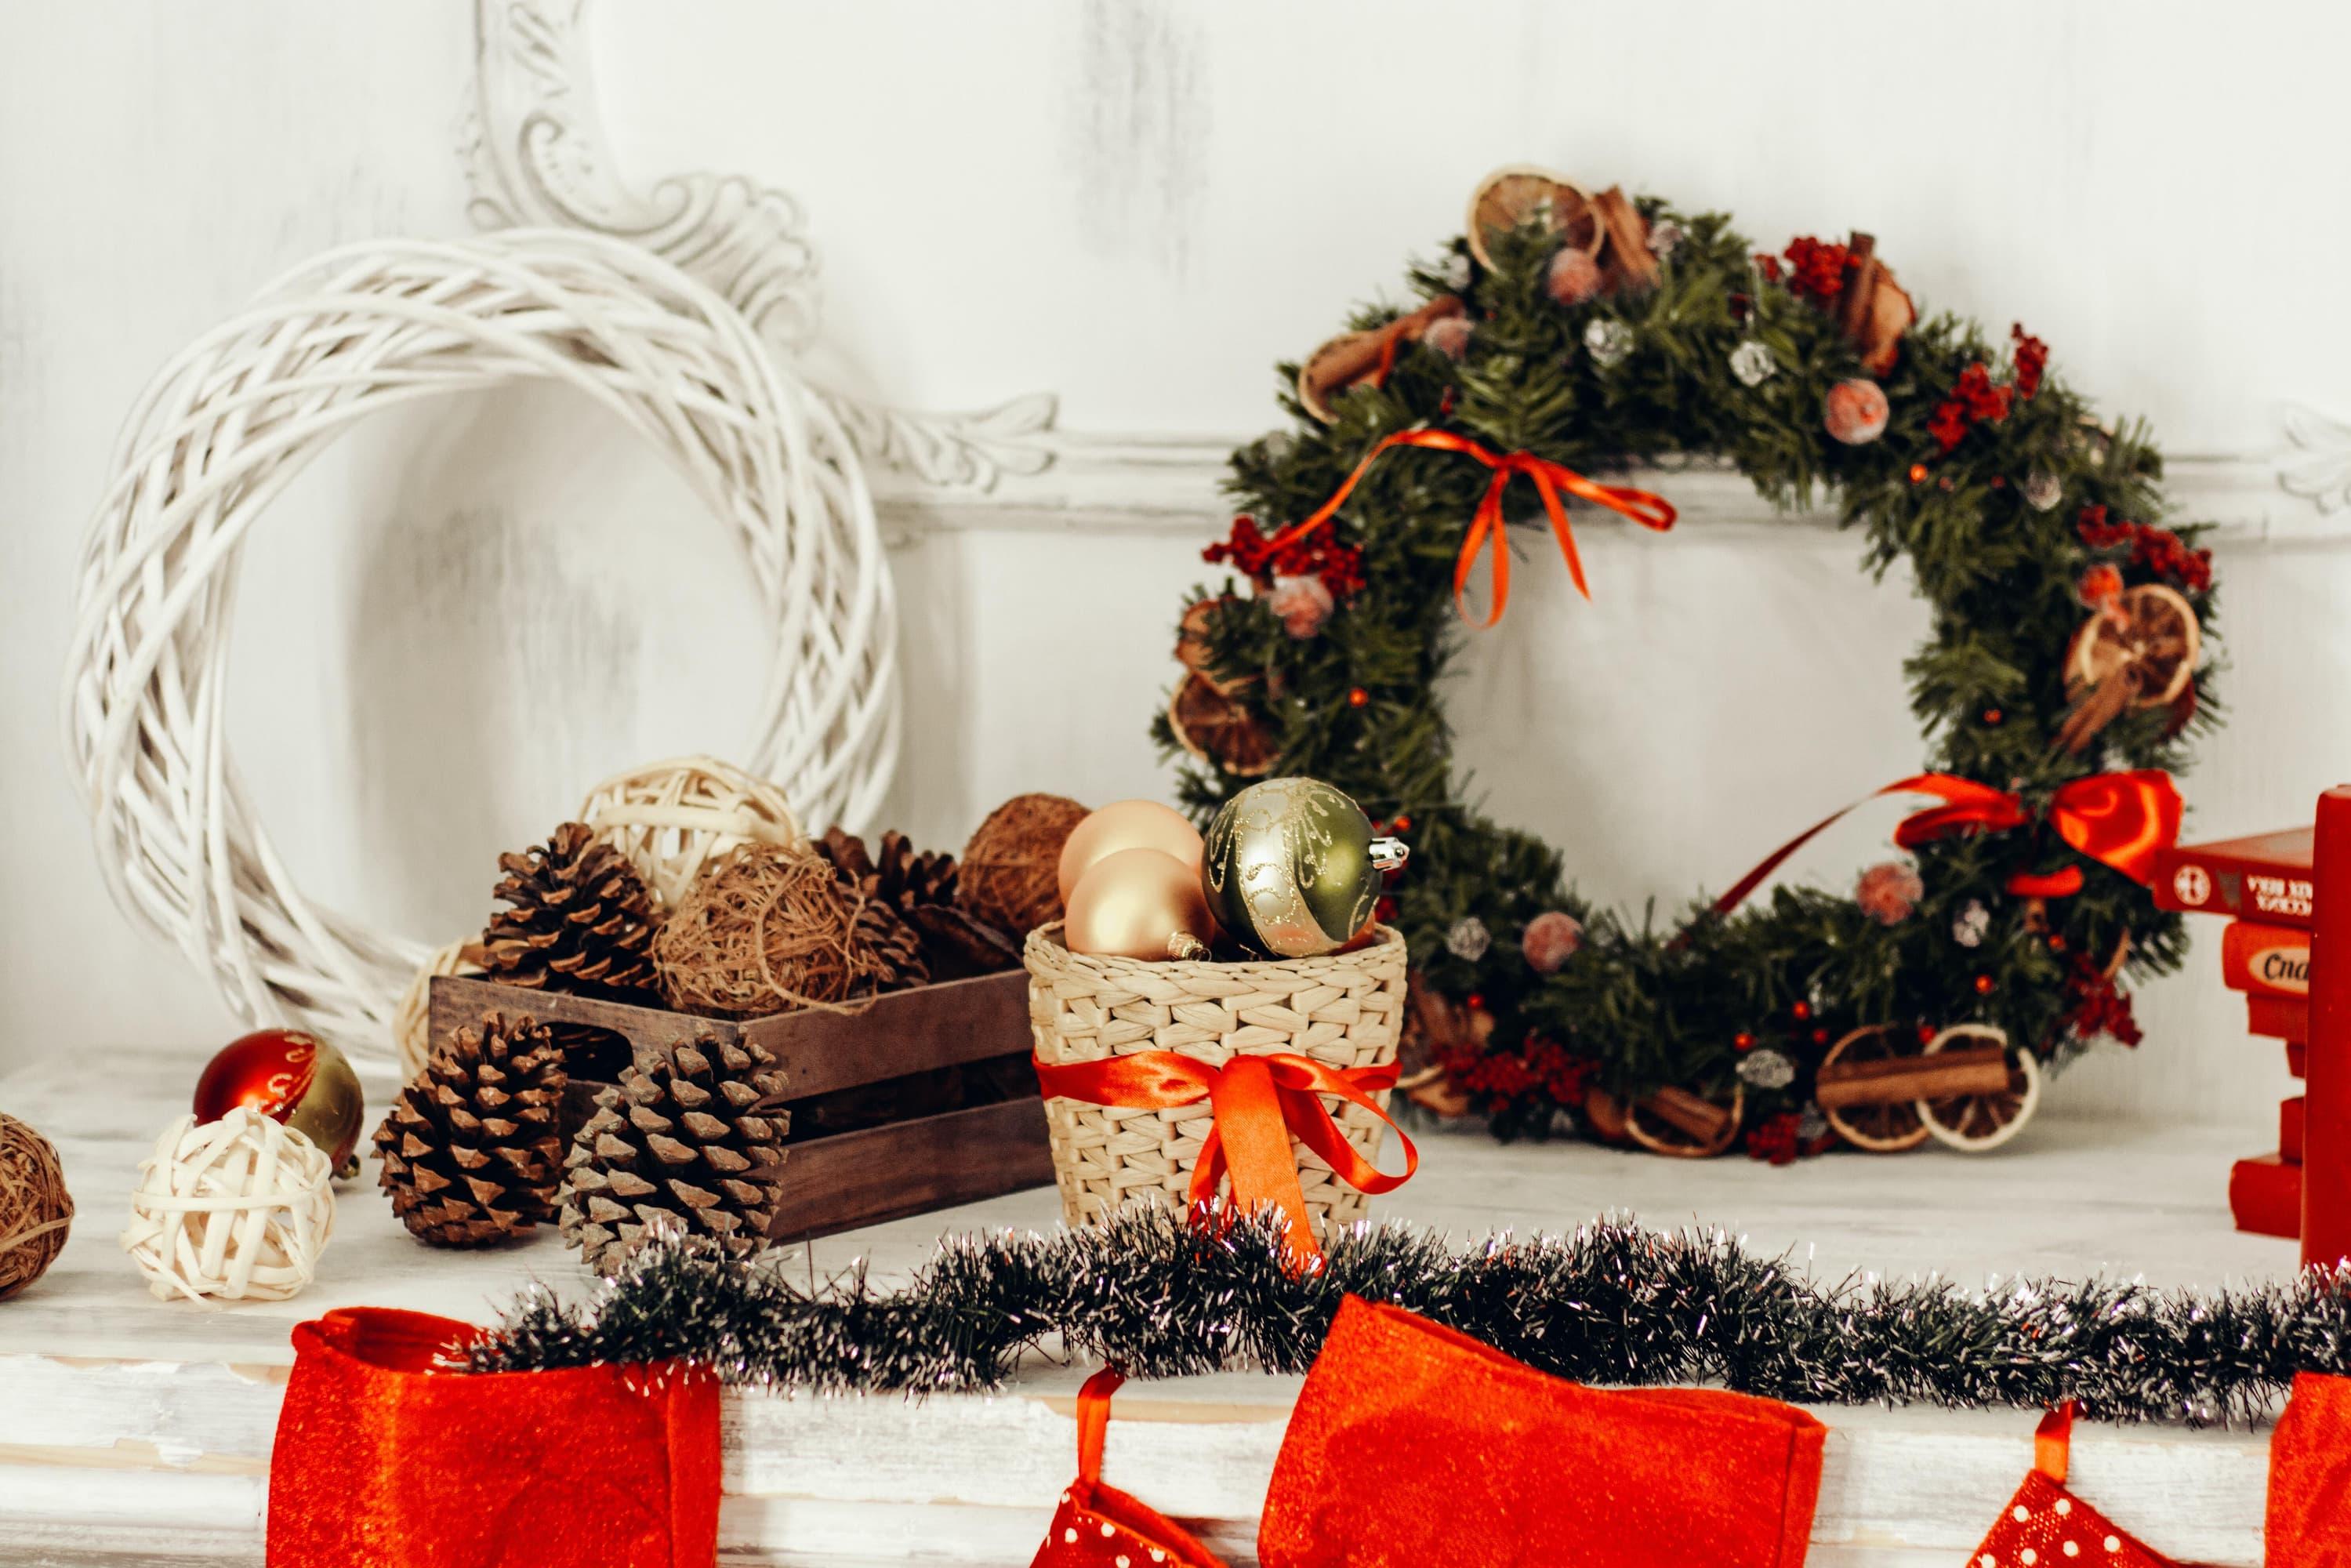 December's Offerings